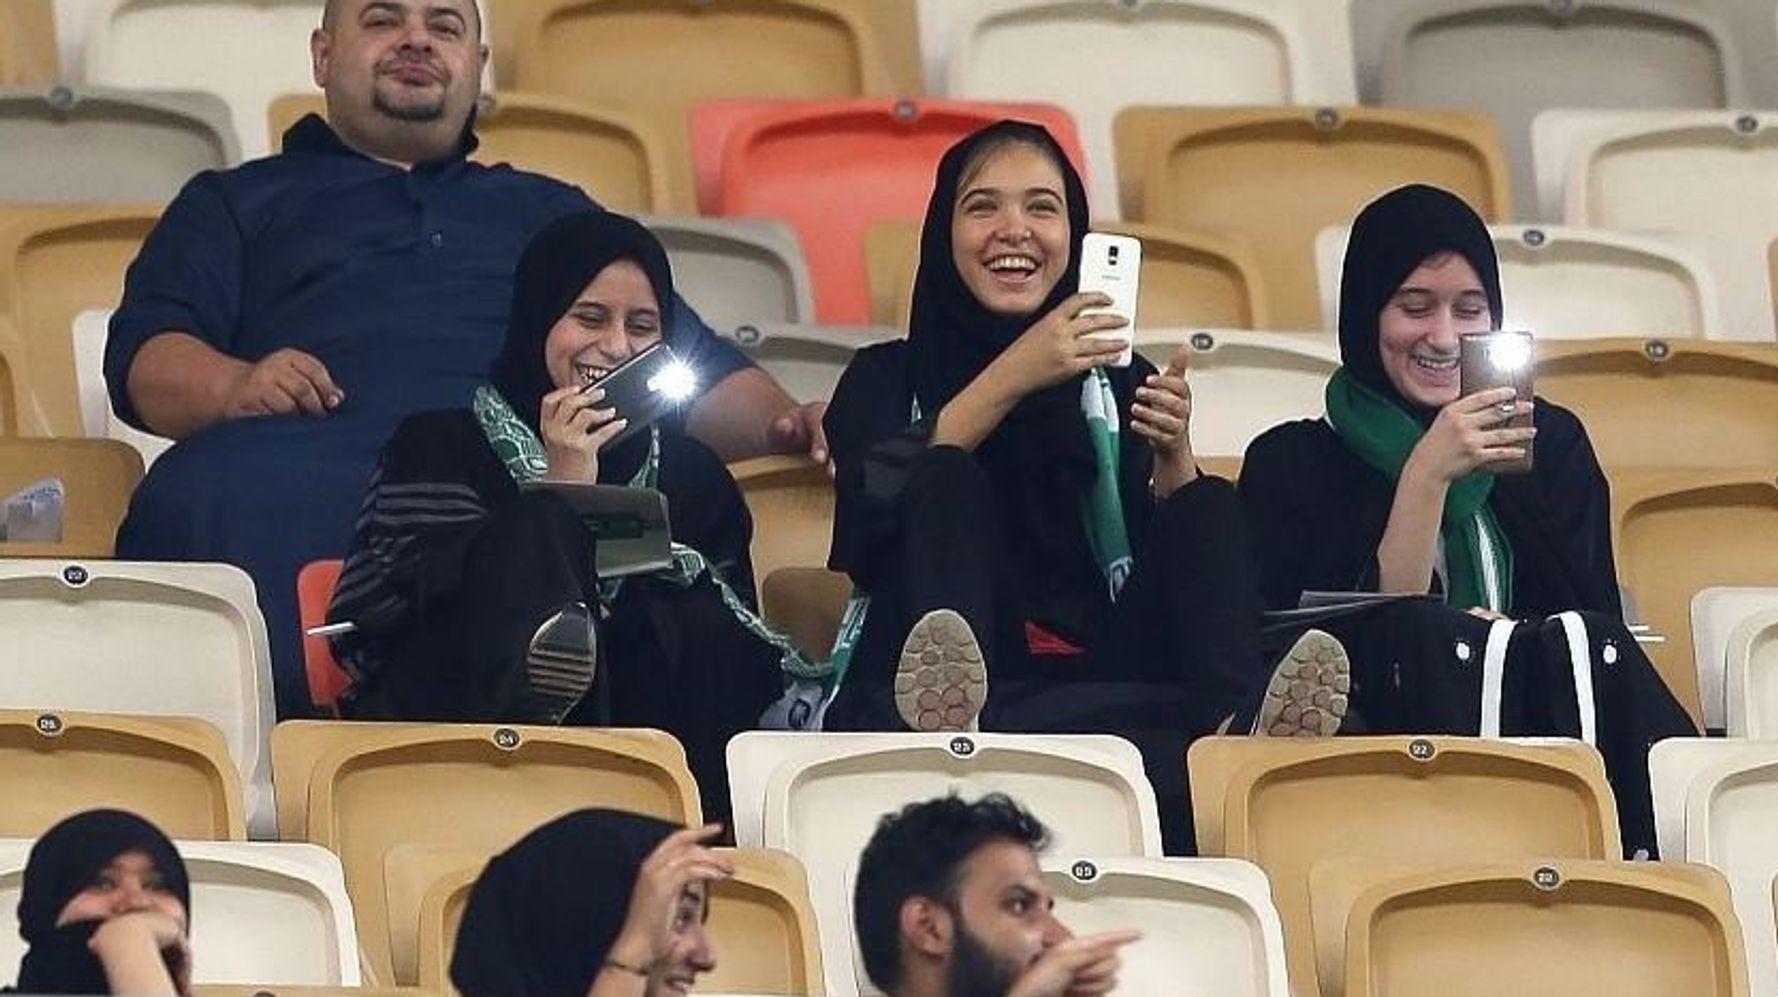 Être une femme en Arabie saoudite - Madame Figaro